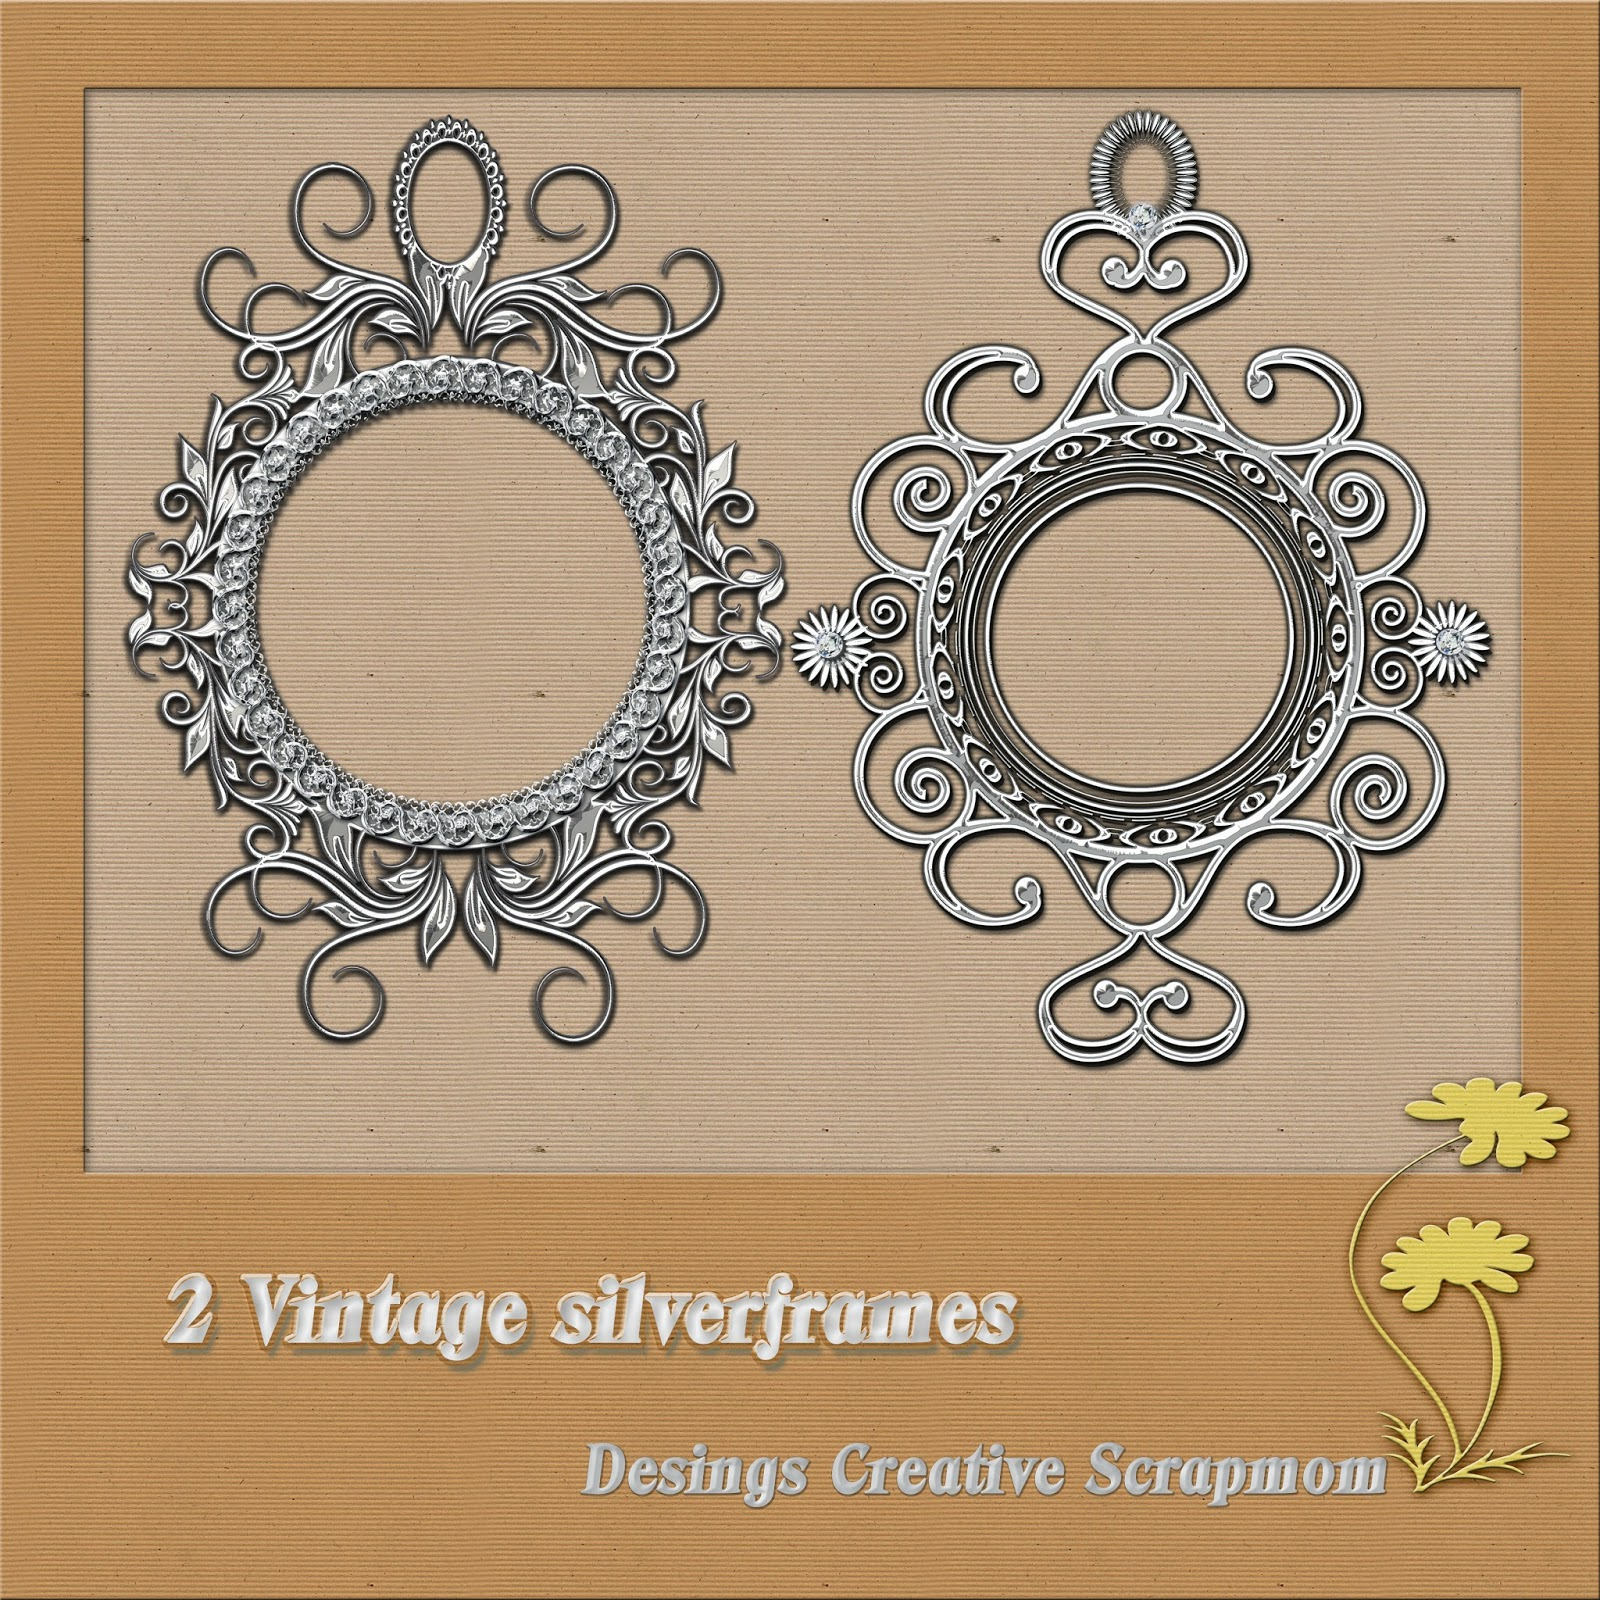 http://3.bp.blogspot.com/-k_LkZZIo2Bw/U3xS44HXTLI/AAAAAAAAEQU/kMfL4zPFXvk/s1600/Preview+2+Vintage+silverframes.jpg